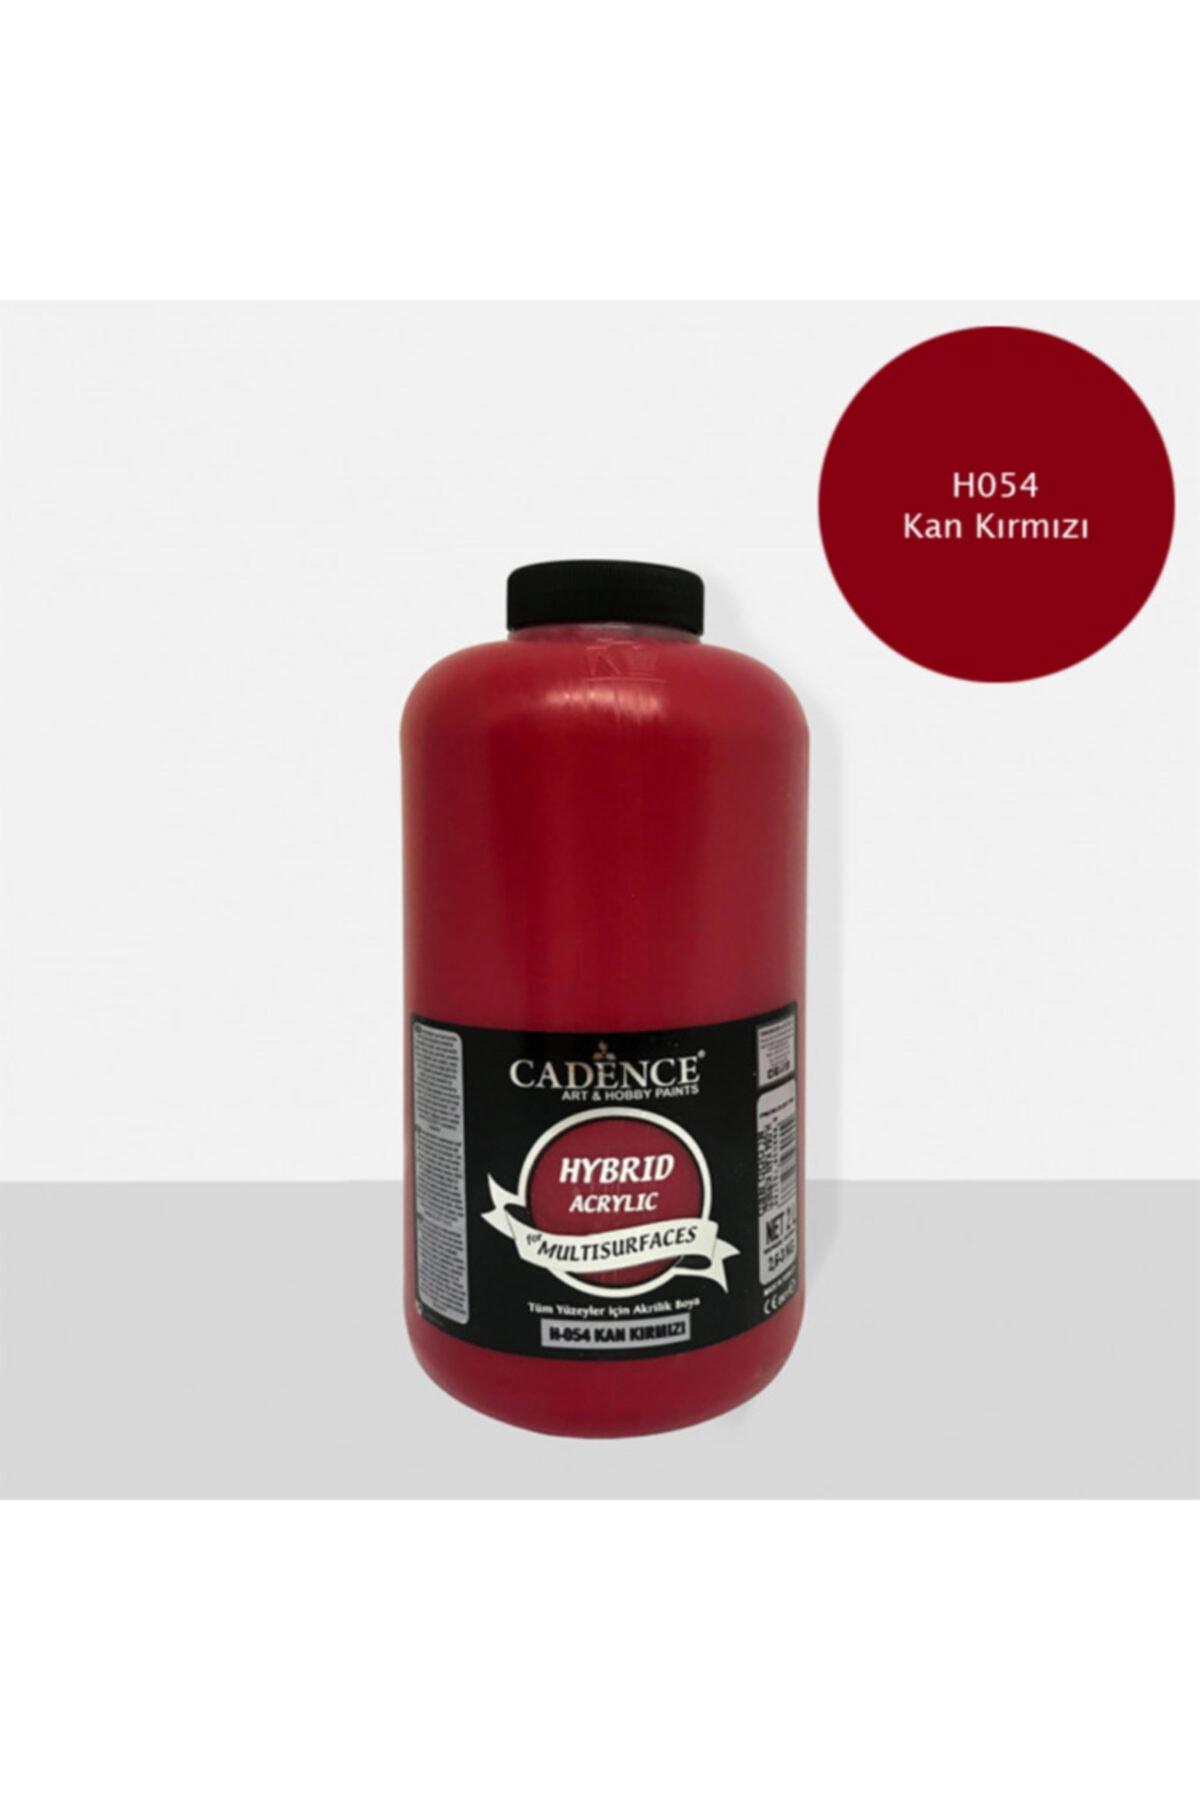 Cadence H-054 Kan Kırmızı 2 Litre Multısurface Hybrıd Akr. 1